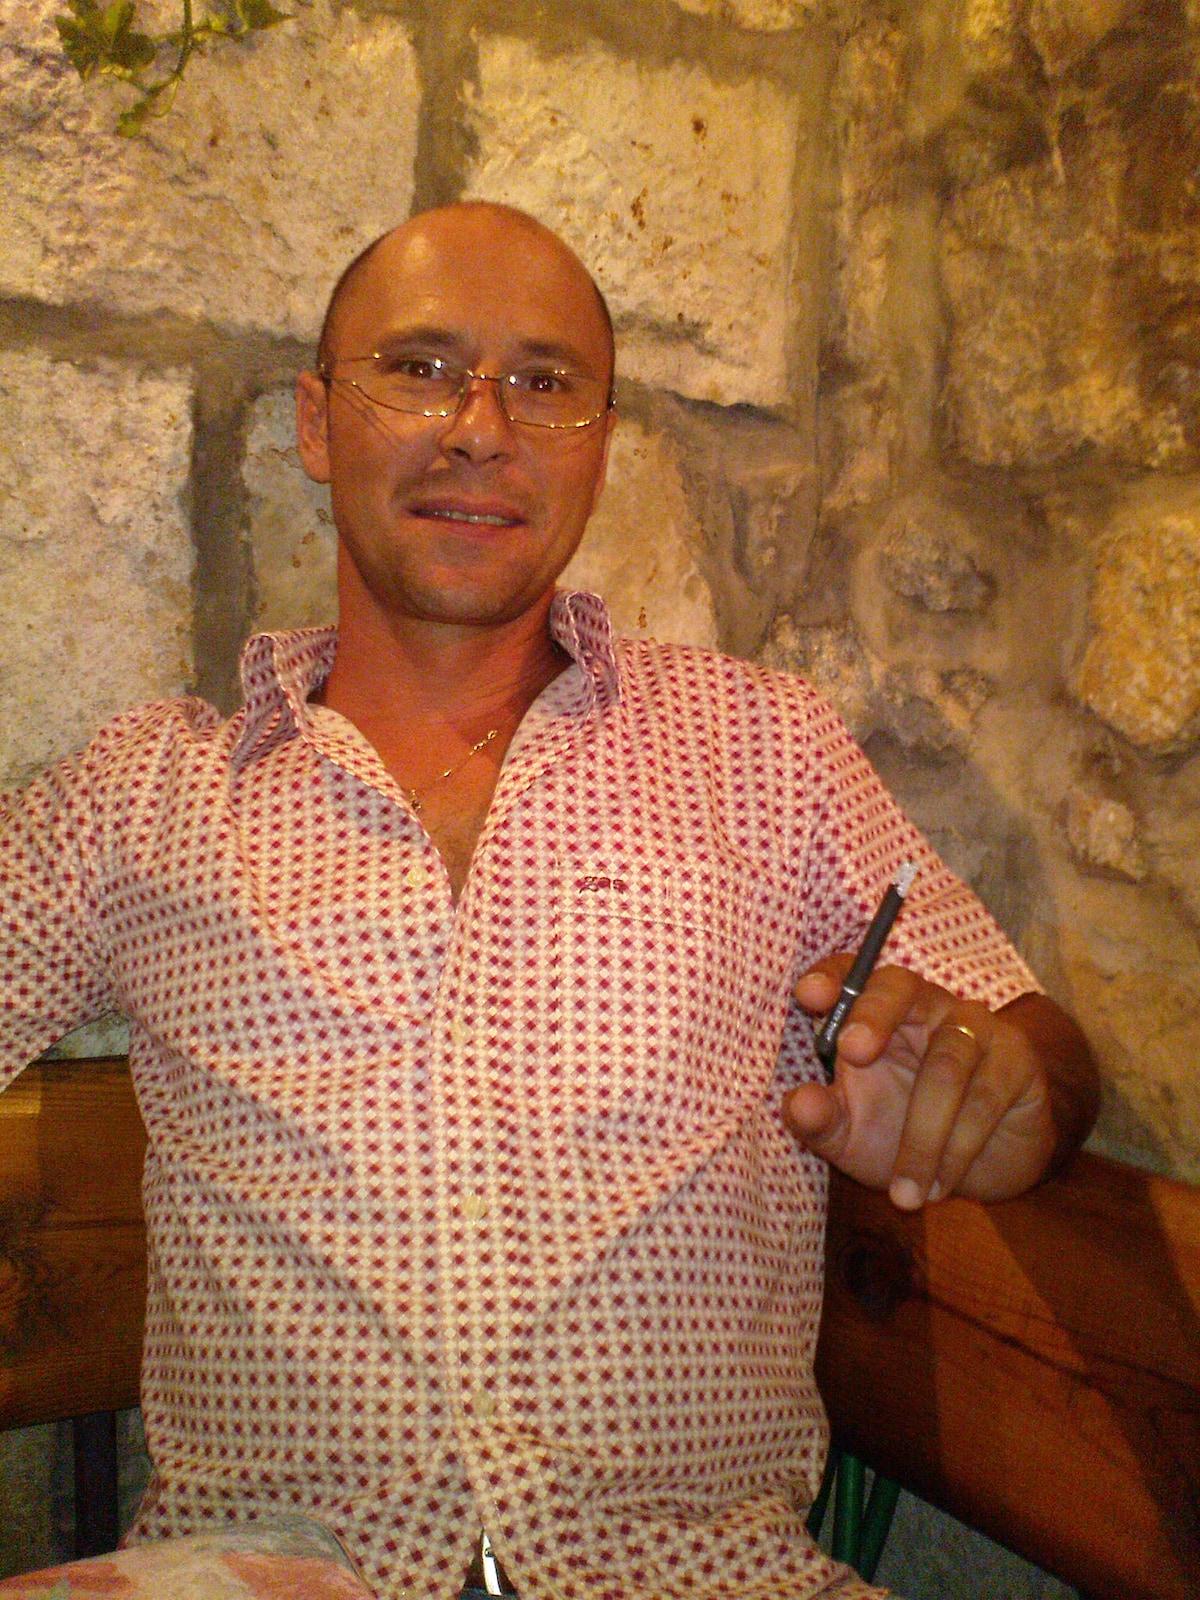 Francesco from Itri